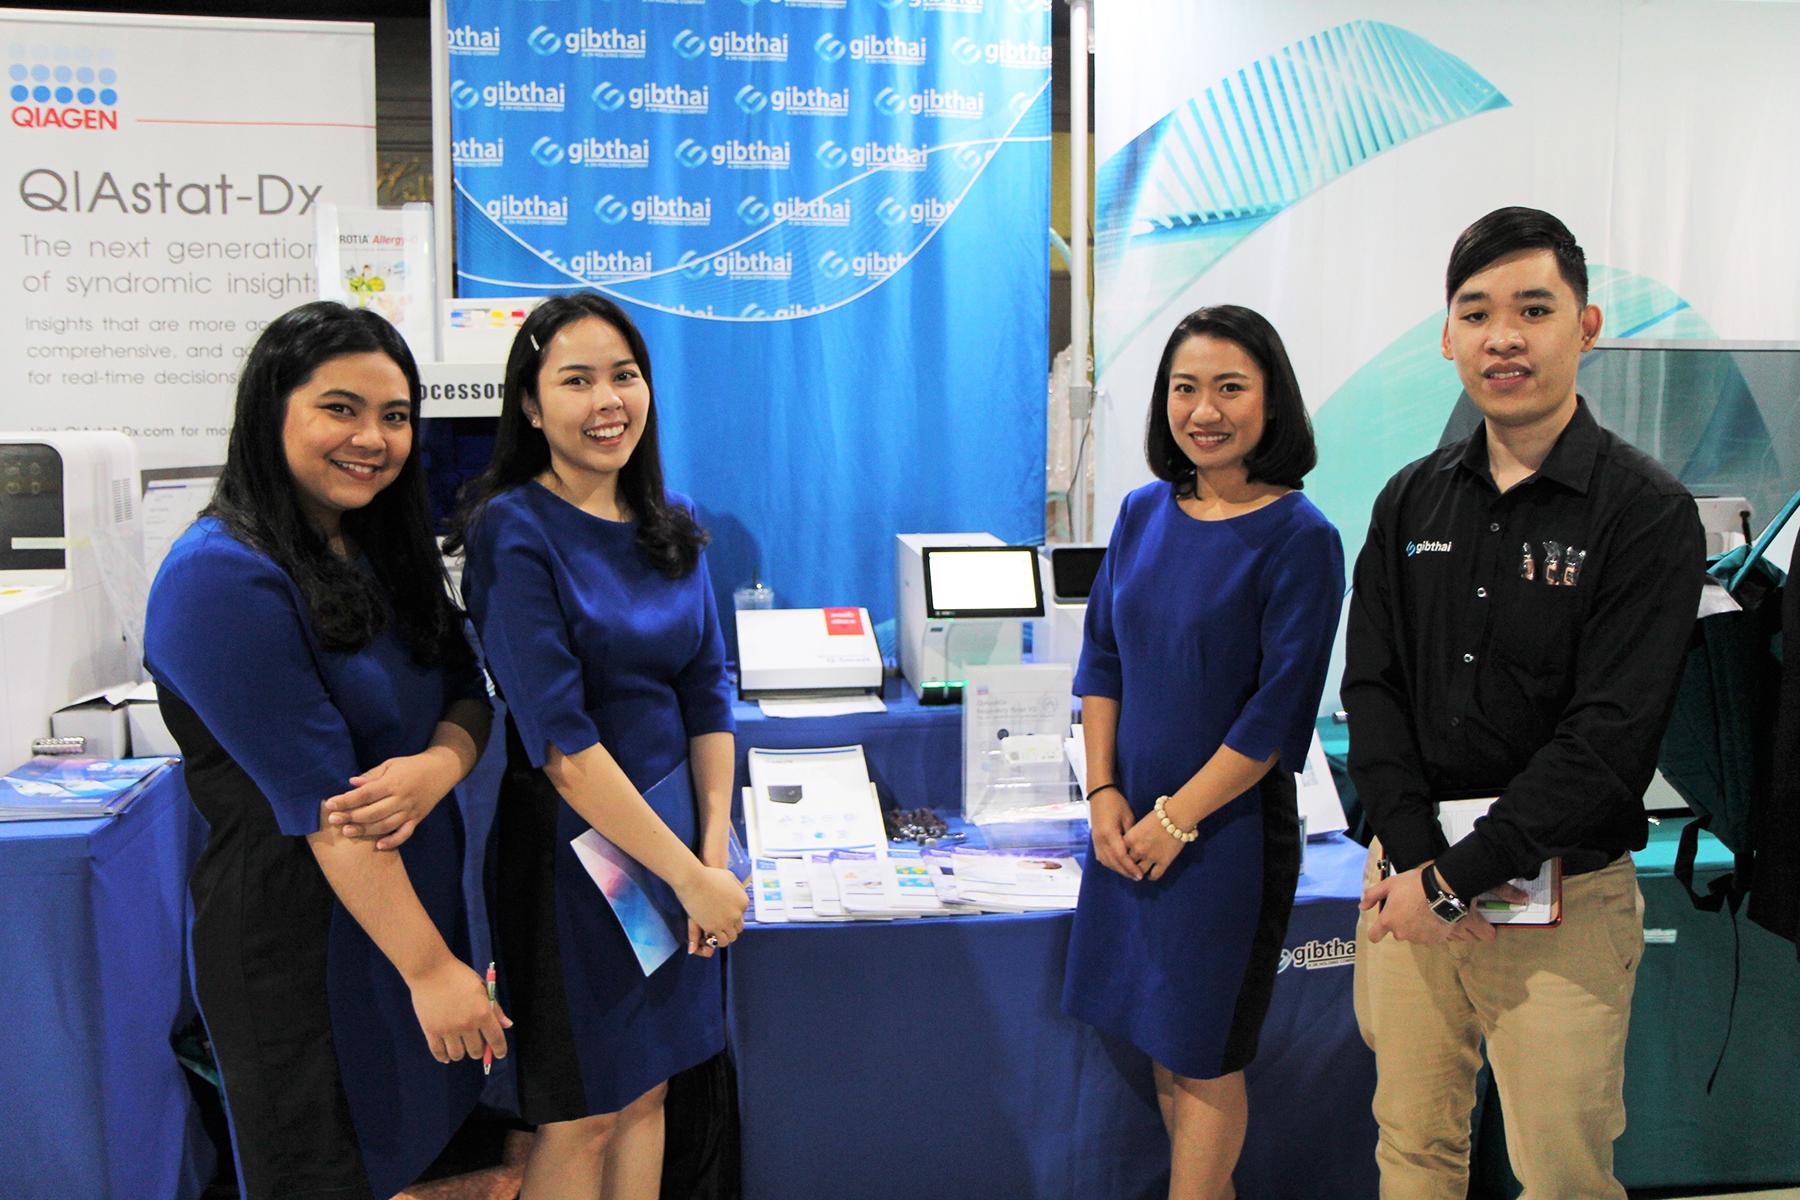 Thailand LA forum 2019 มหกรรมคุณภาพมาตรฐานห้องปฏิบัติการระดับชาติ ครั้งที่ 8 ประจำปี 2562